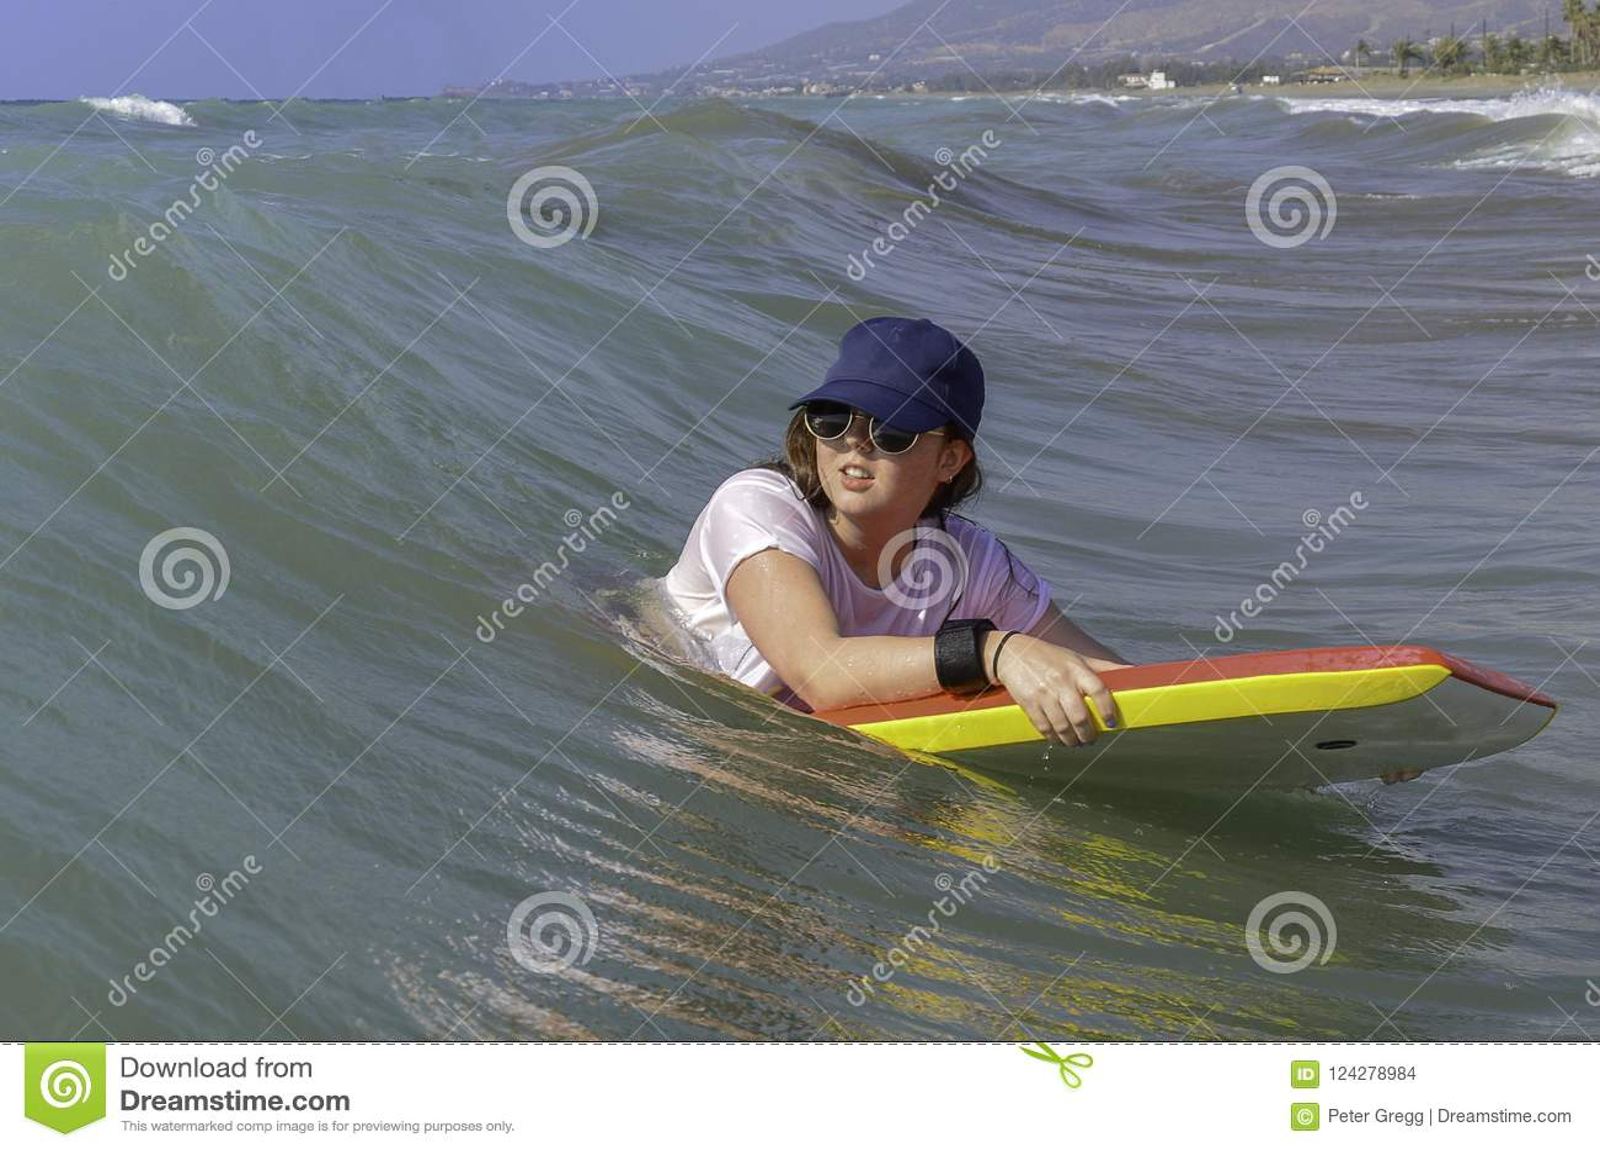 Teenage girl on red and Yellow bodyboard